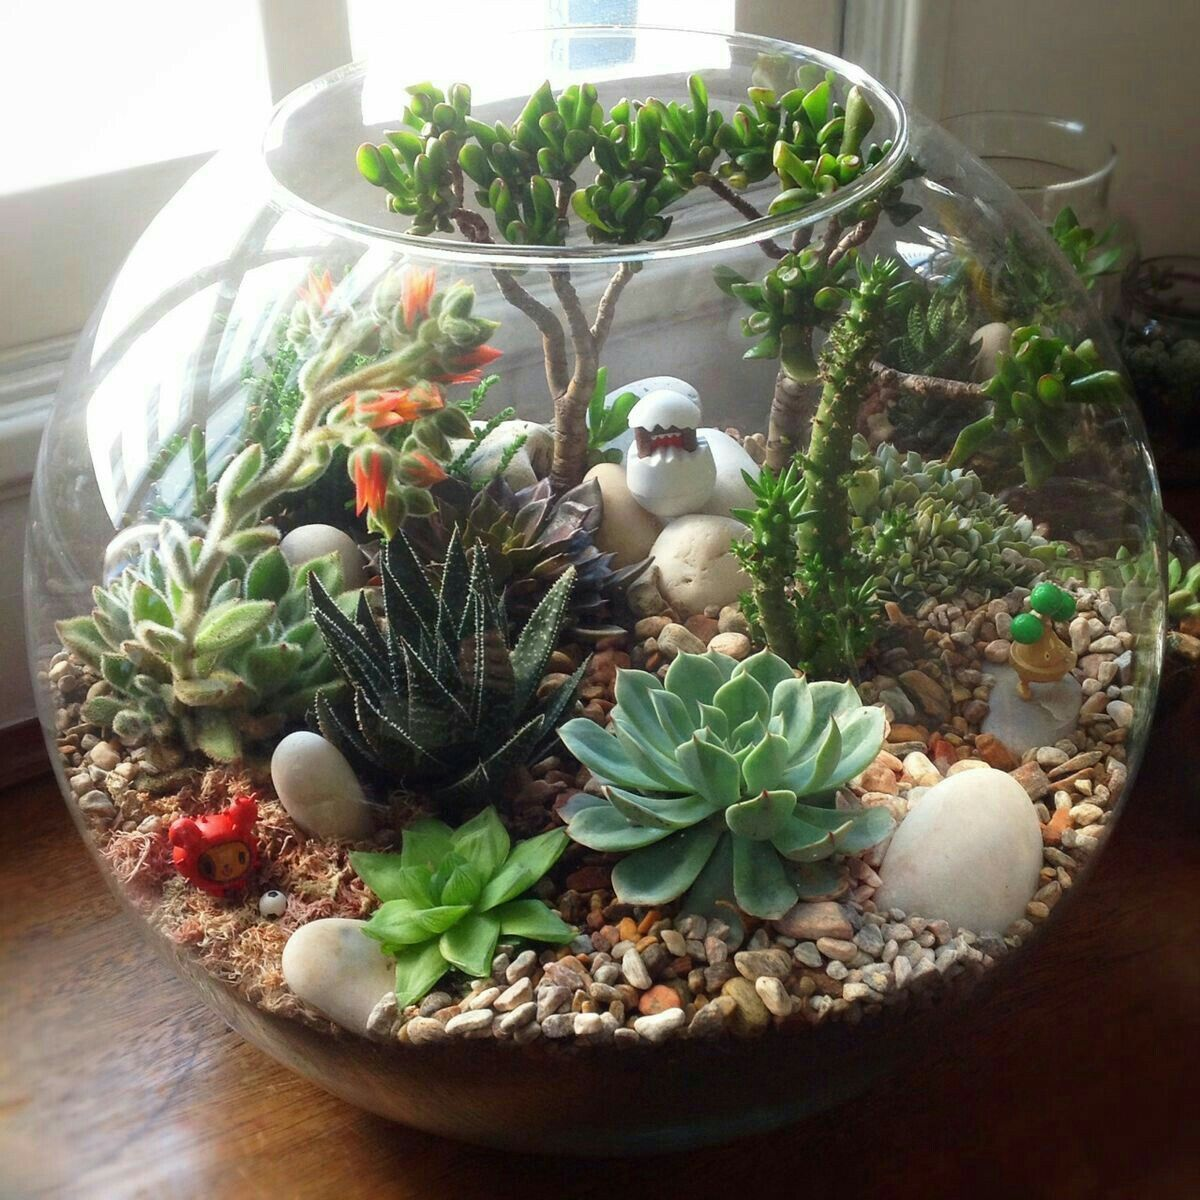 15 Of The Best Succulent Terrarium Ideas Organize With Sandy